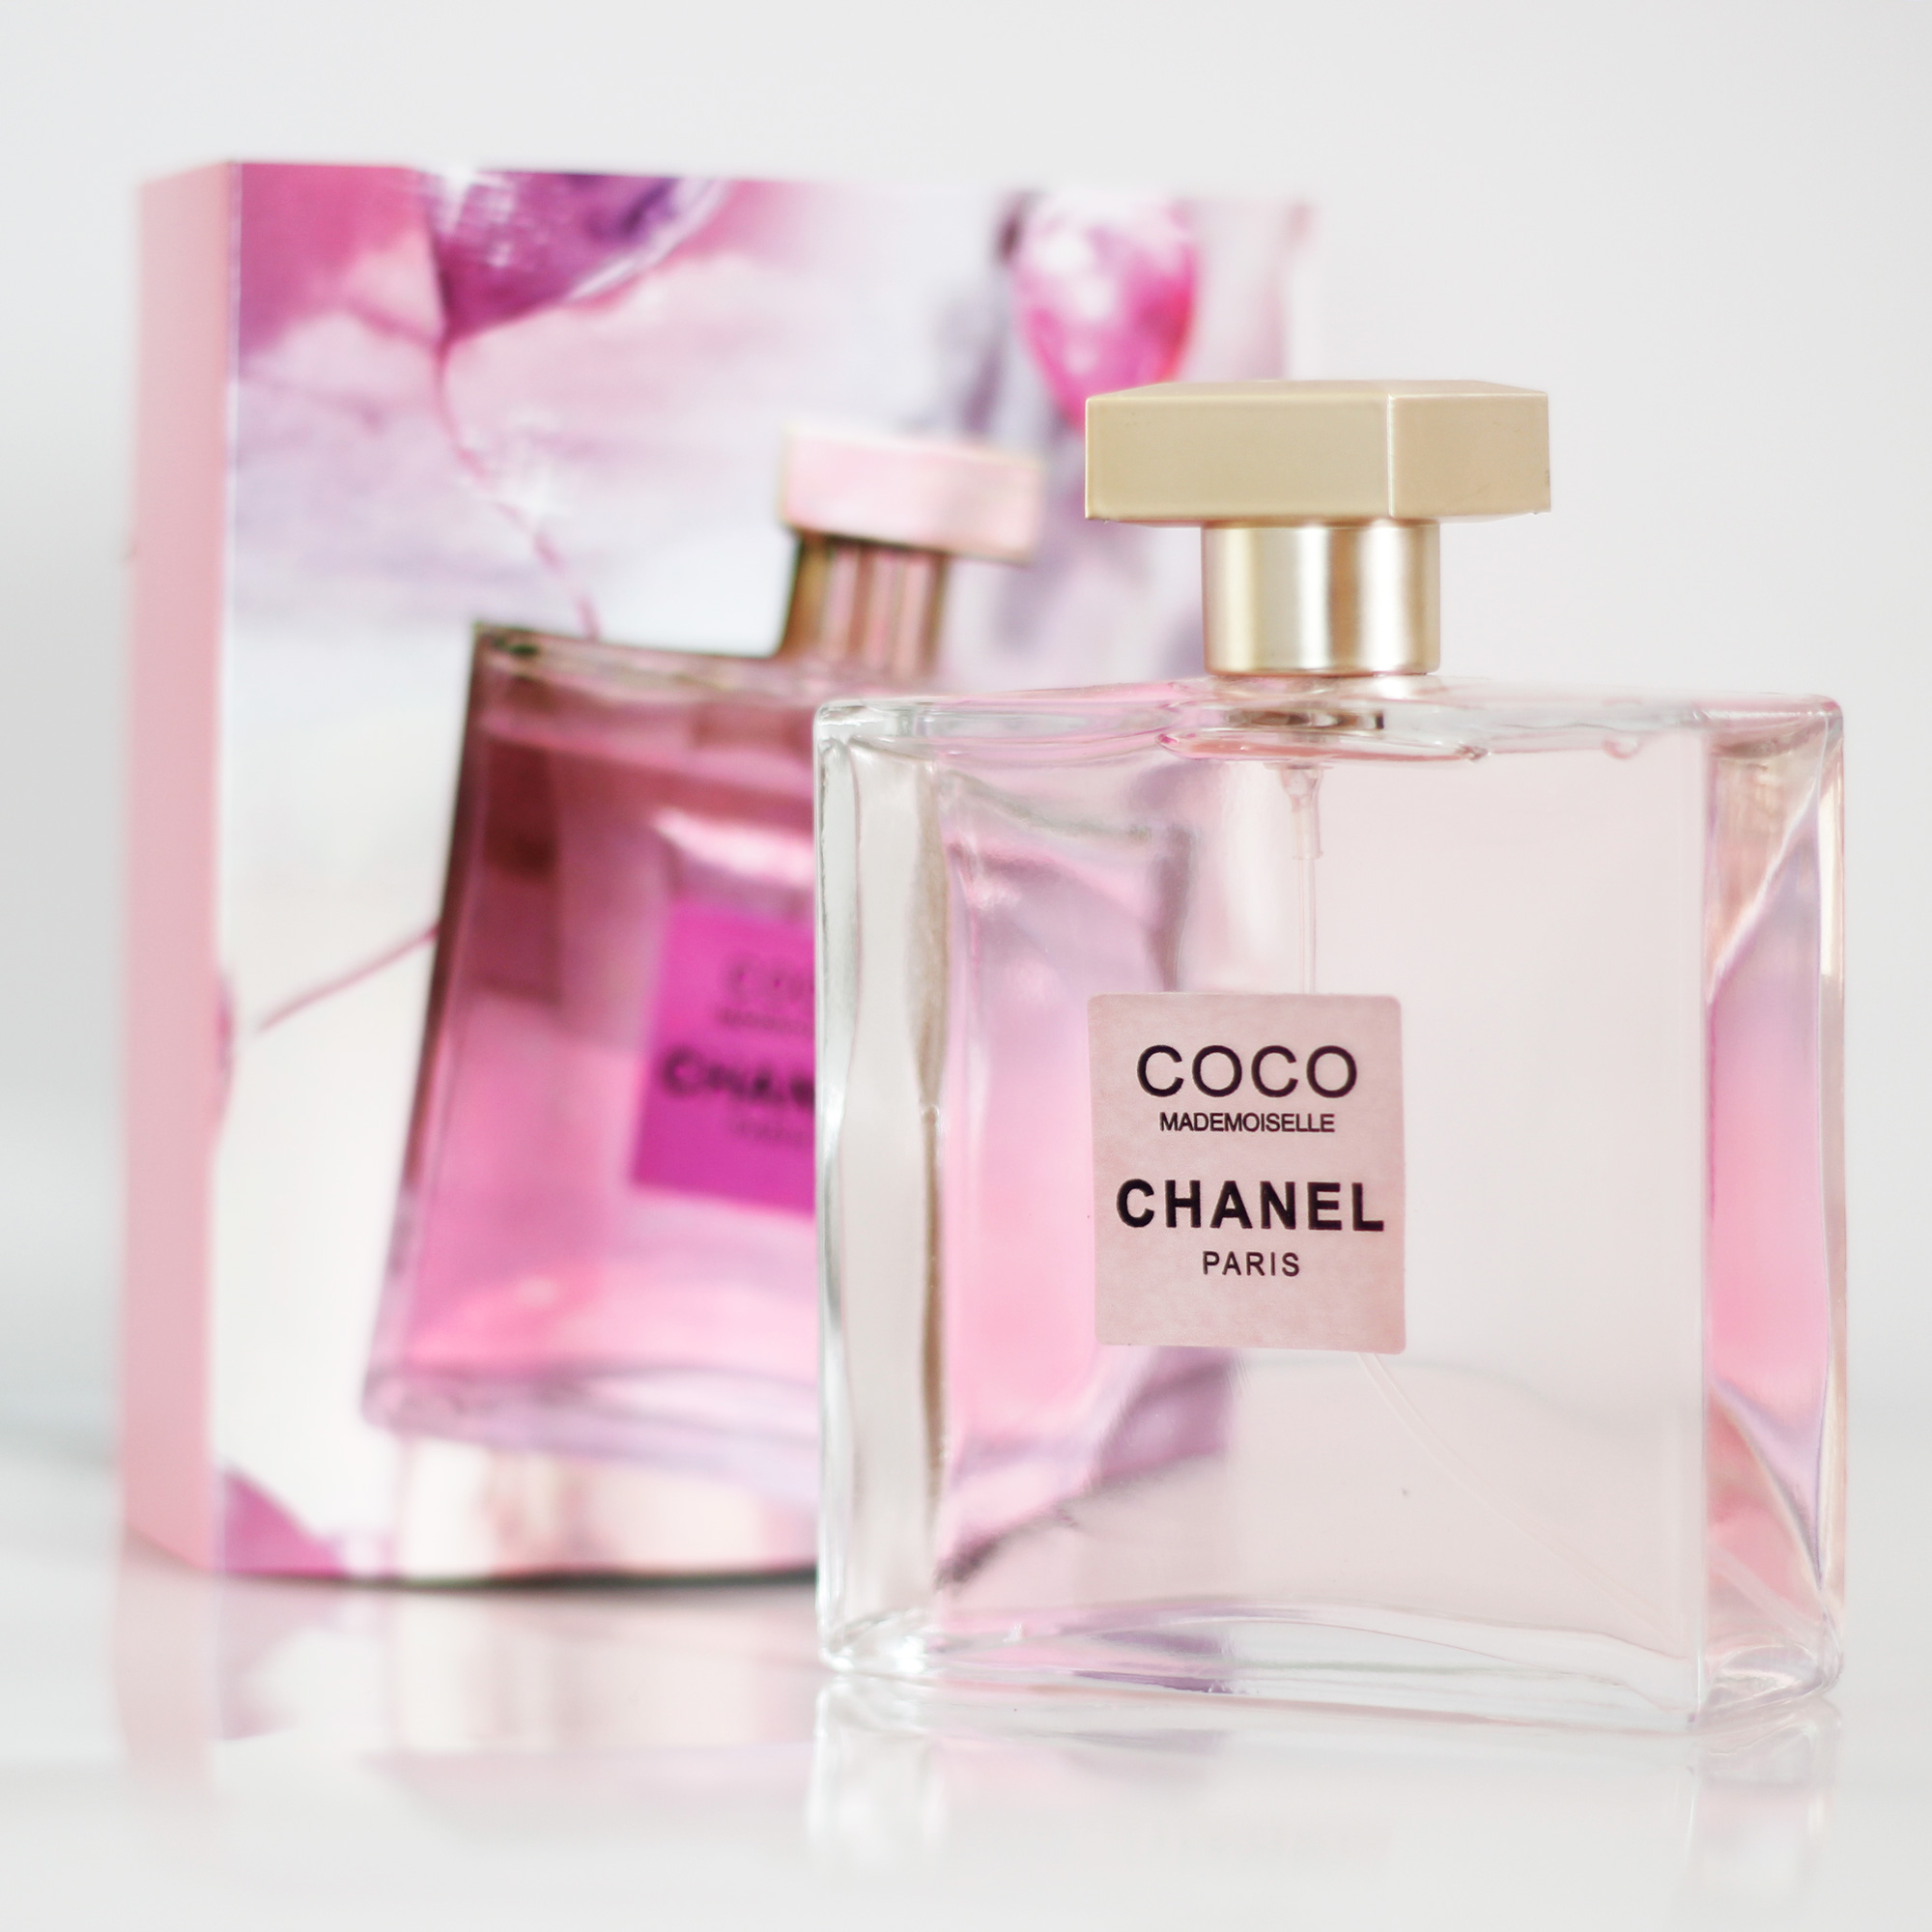 Nước hoa Chanel CoCo 100ml.